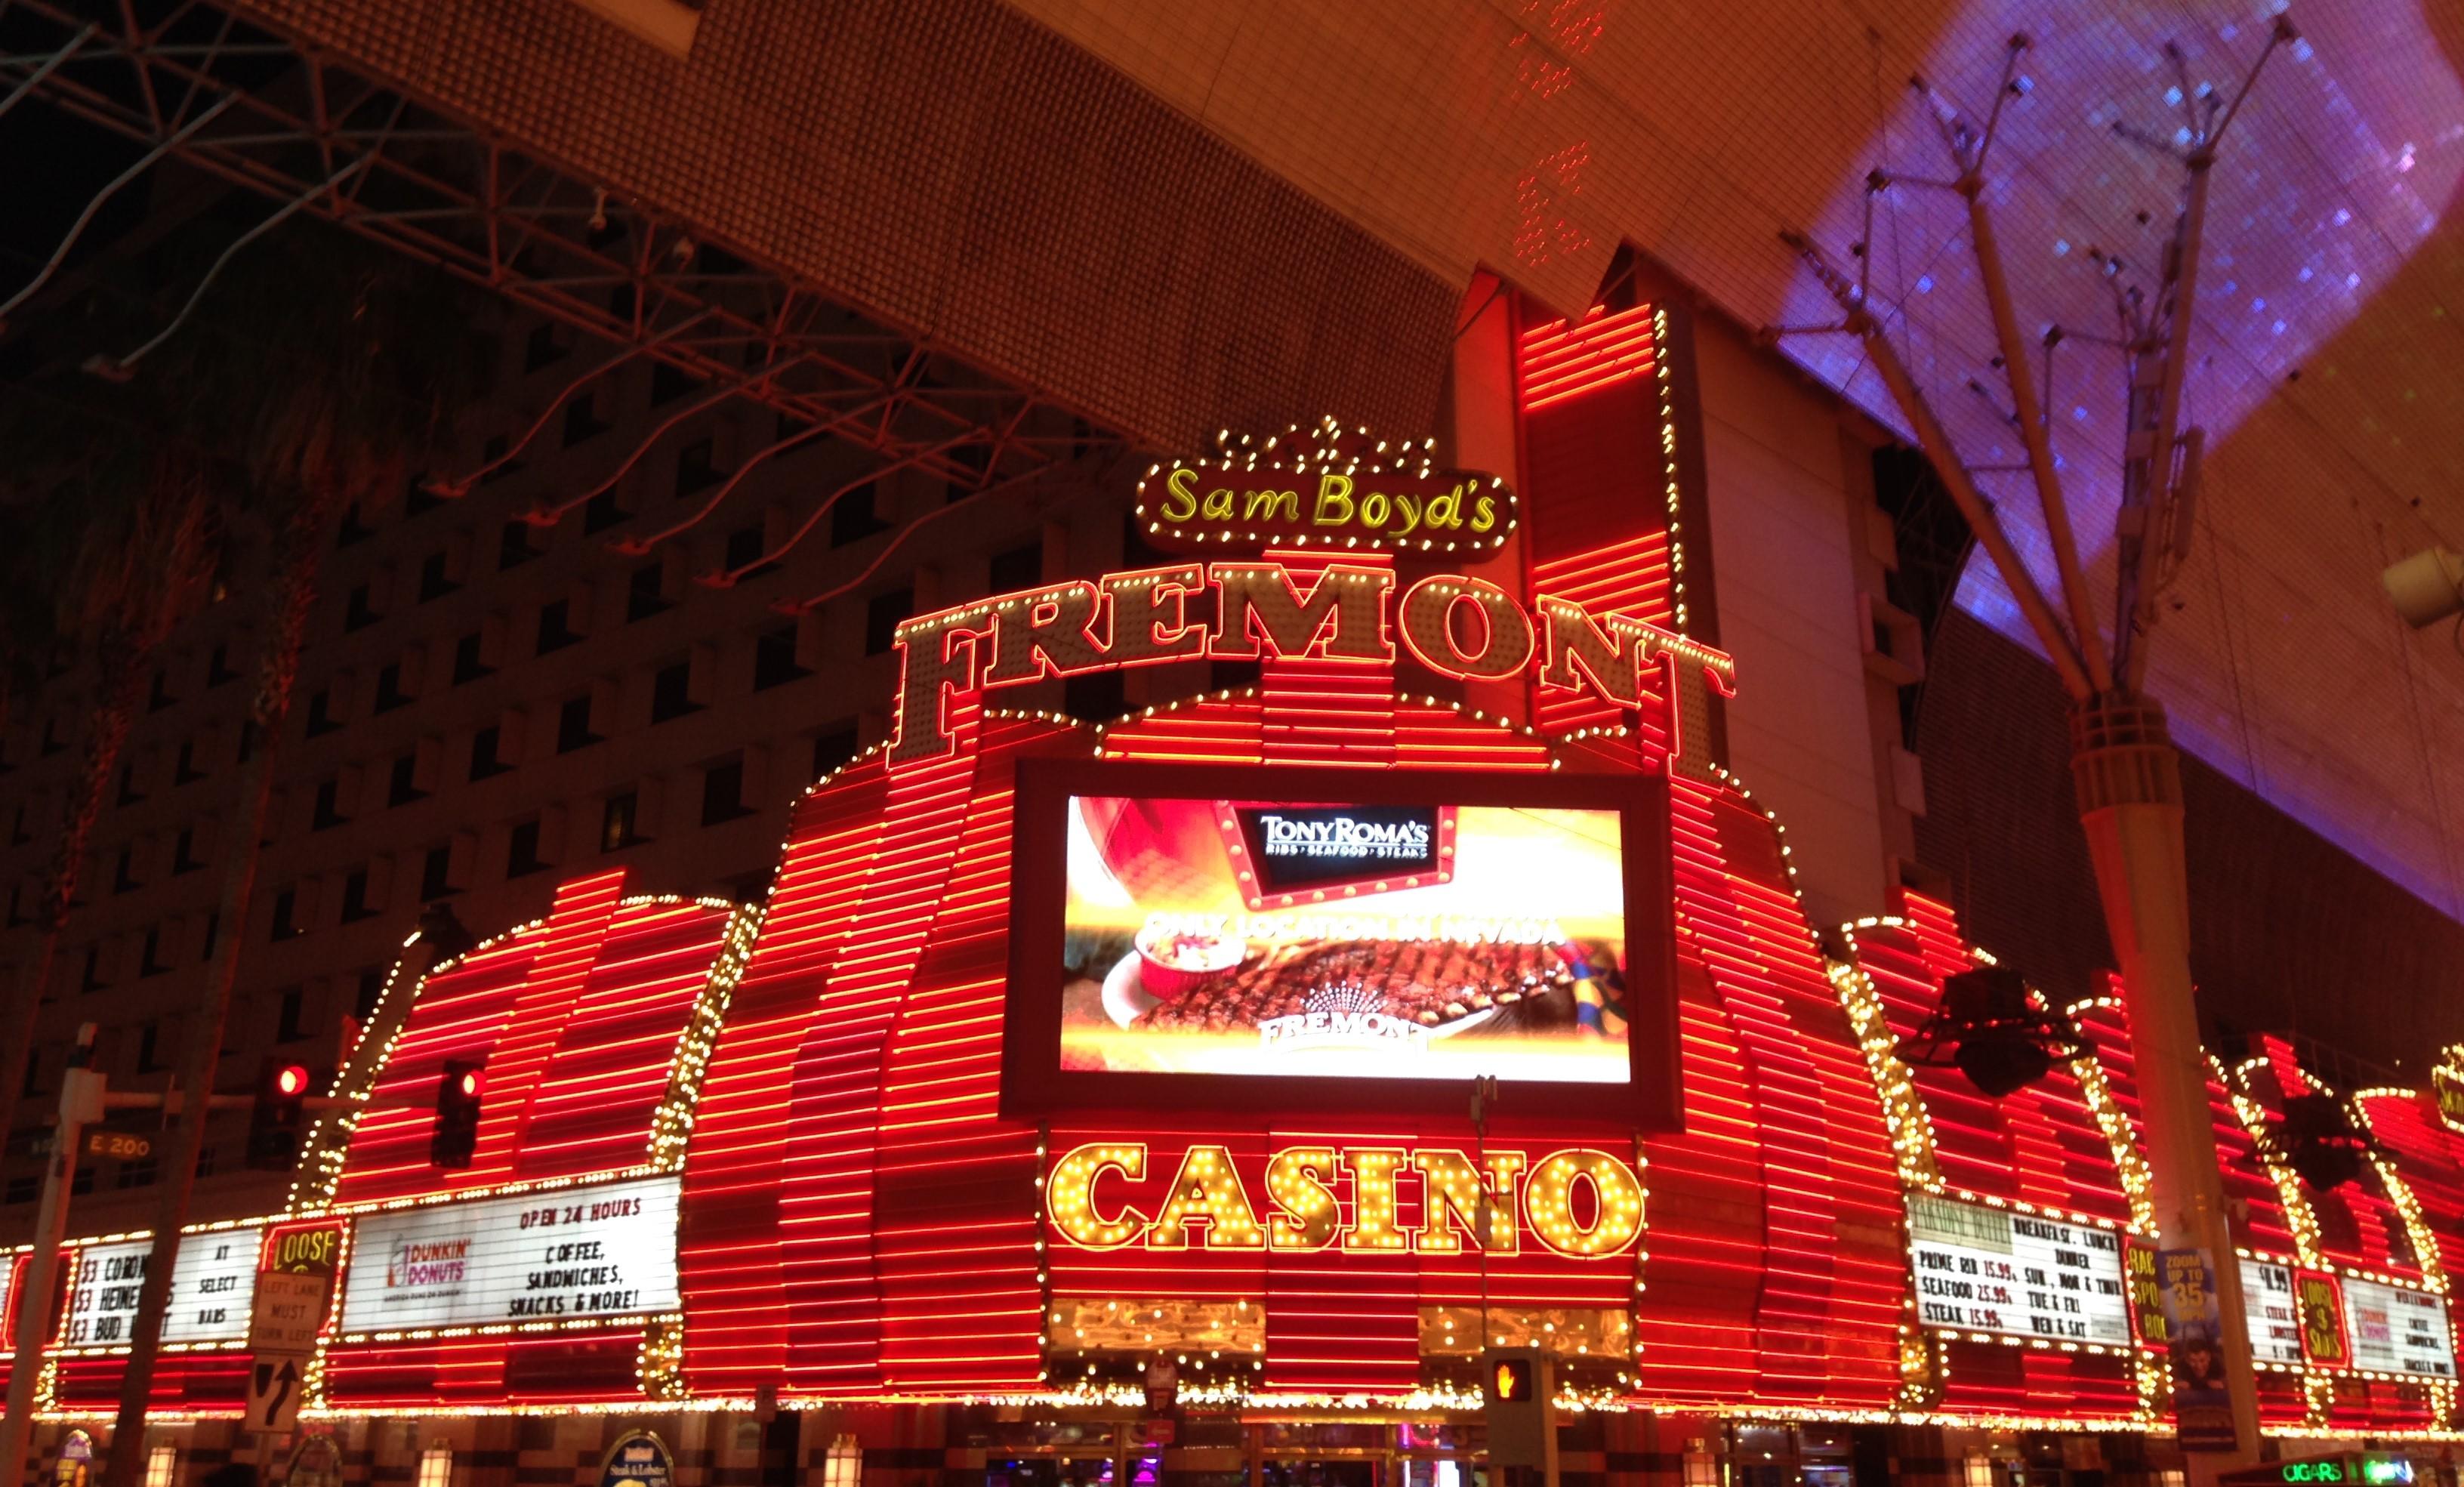 Fremont Hotel and Casino 2019, Fremont Hotel and Casino Las Vegas, Fremont Hotel 2019, Fremont Casino 2019, Fremont Las Vegas 2019, Fremont Hotel Las Vegas 2019